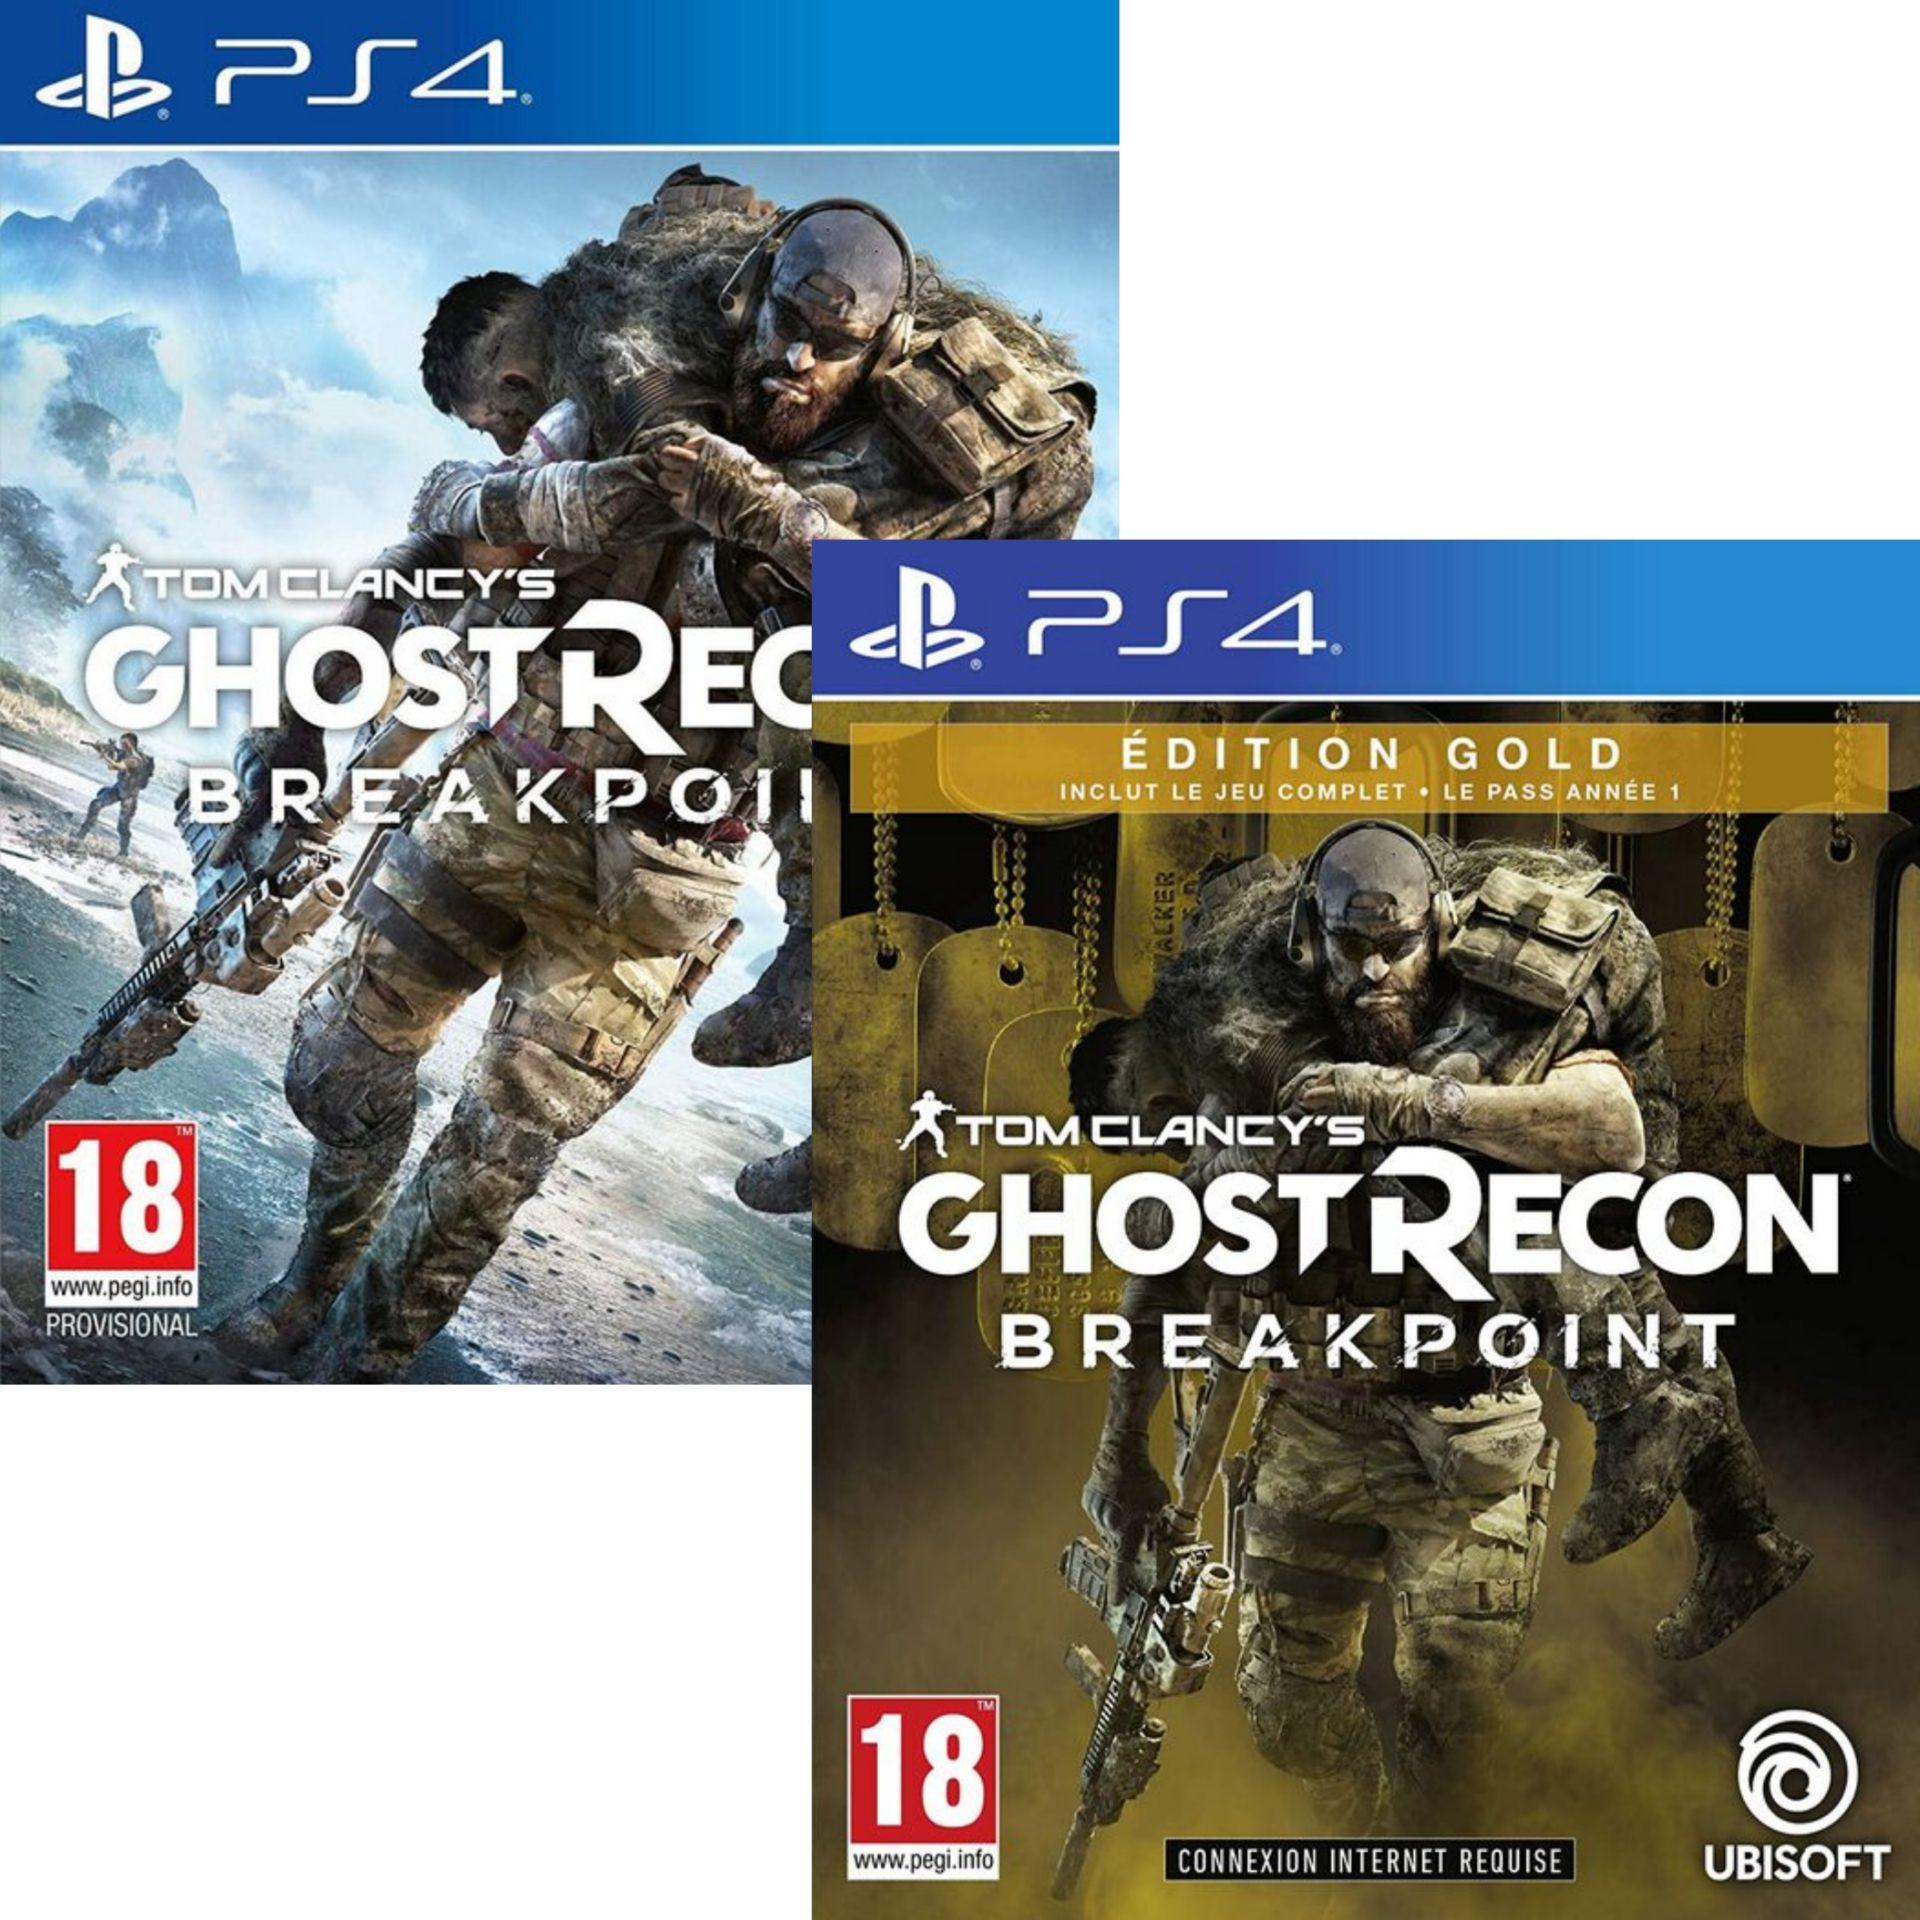 Tom Clancy's Ghost Recon : Breakpoint sur PS4 (Version gold à 5.99€ sur PS4 & Xbox One)